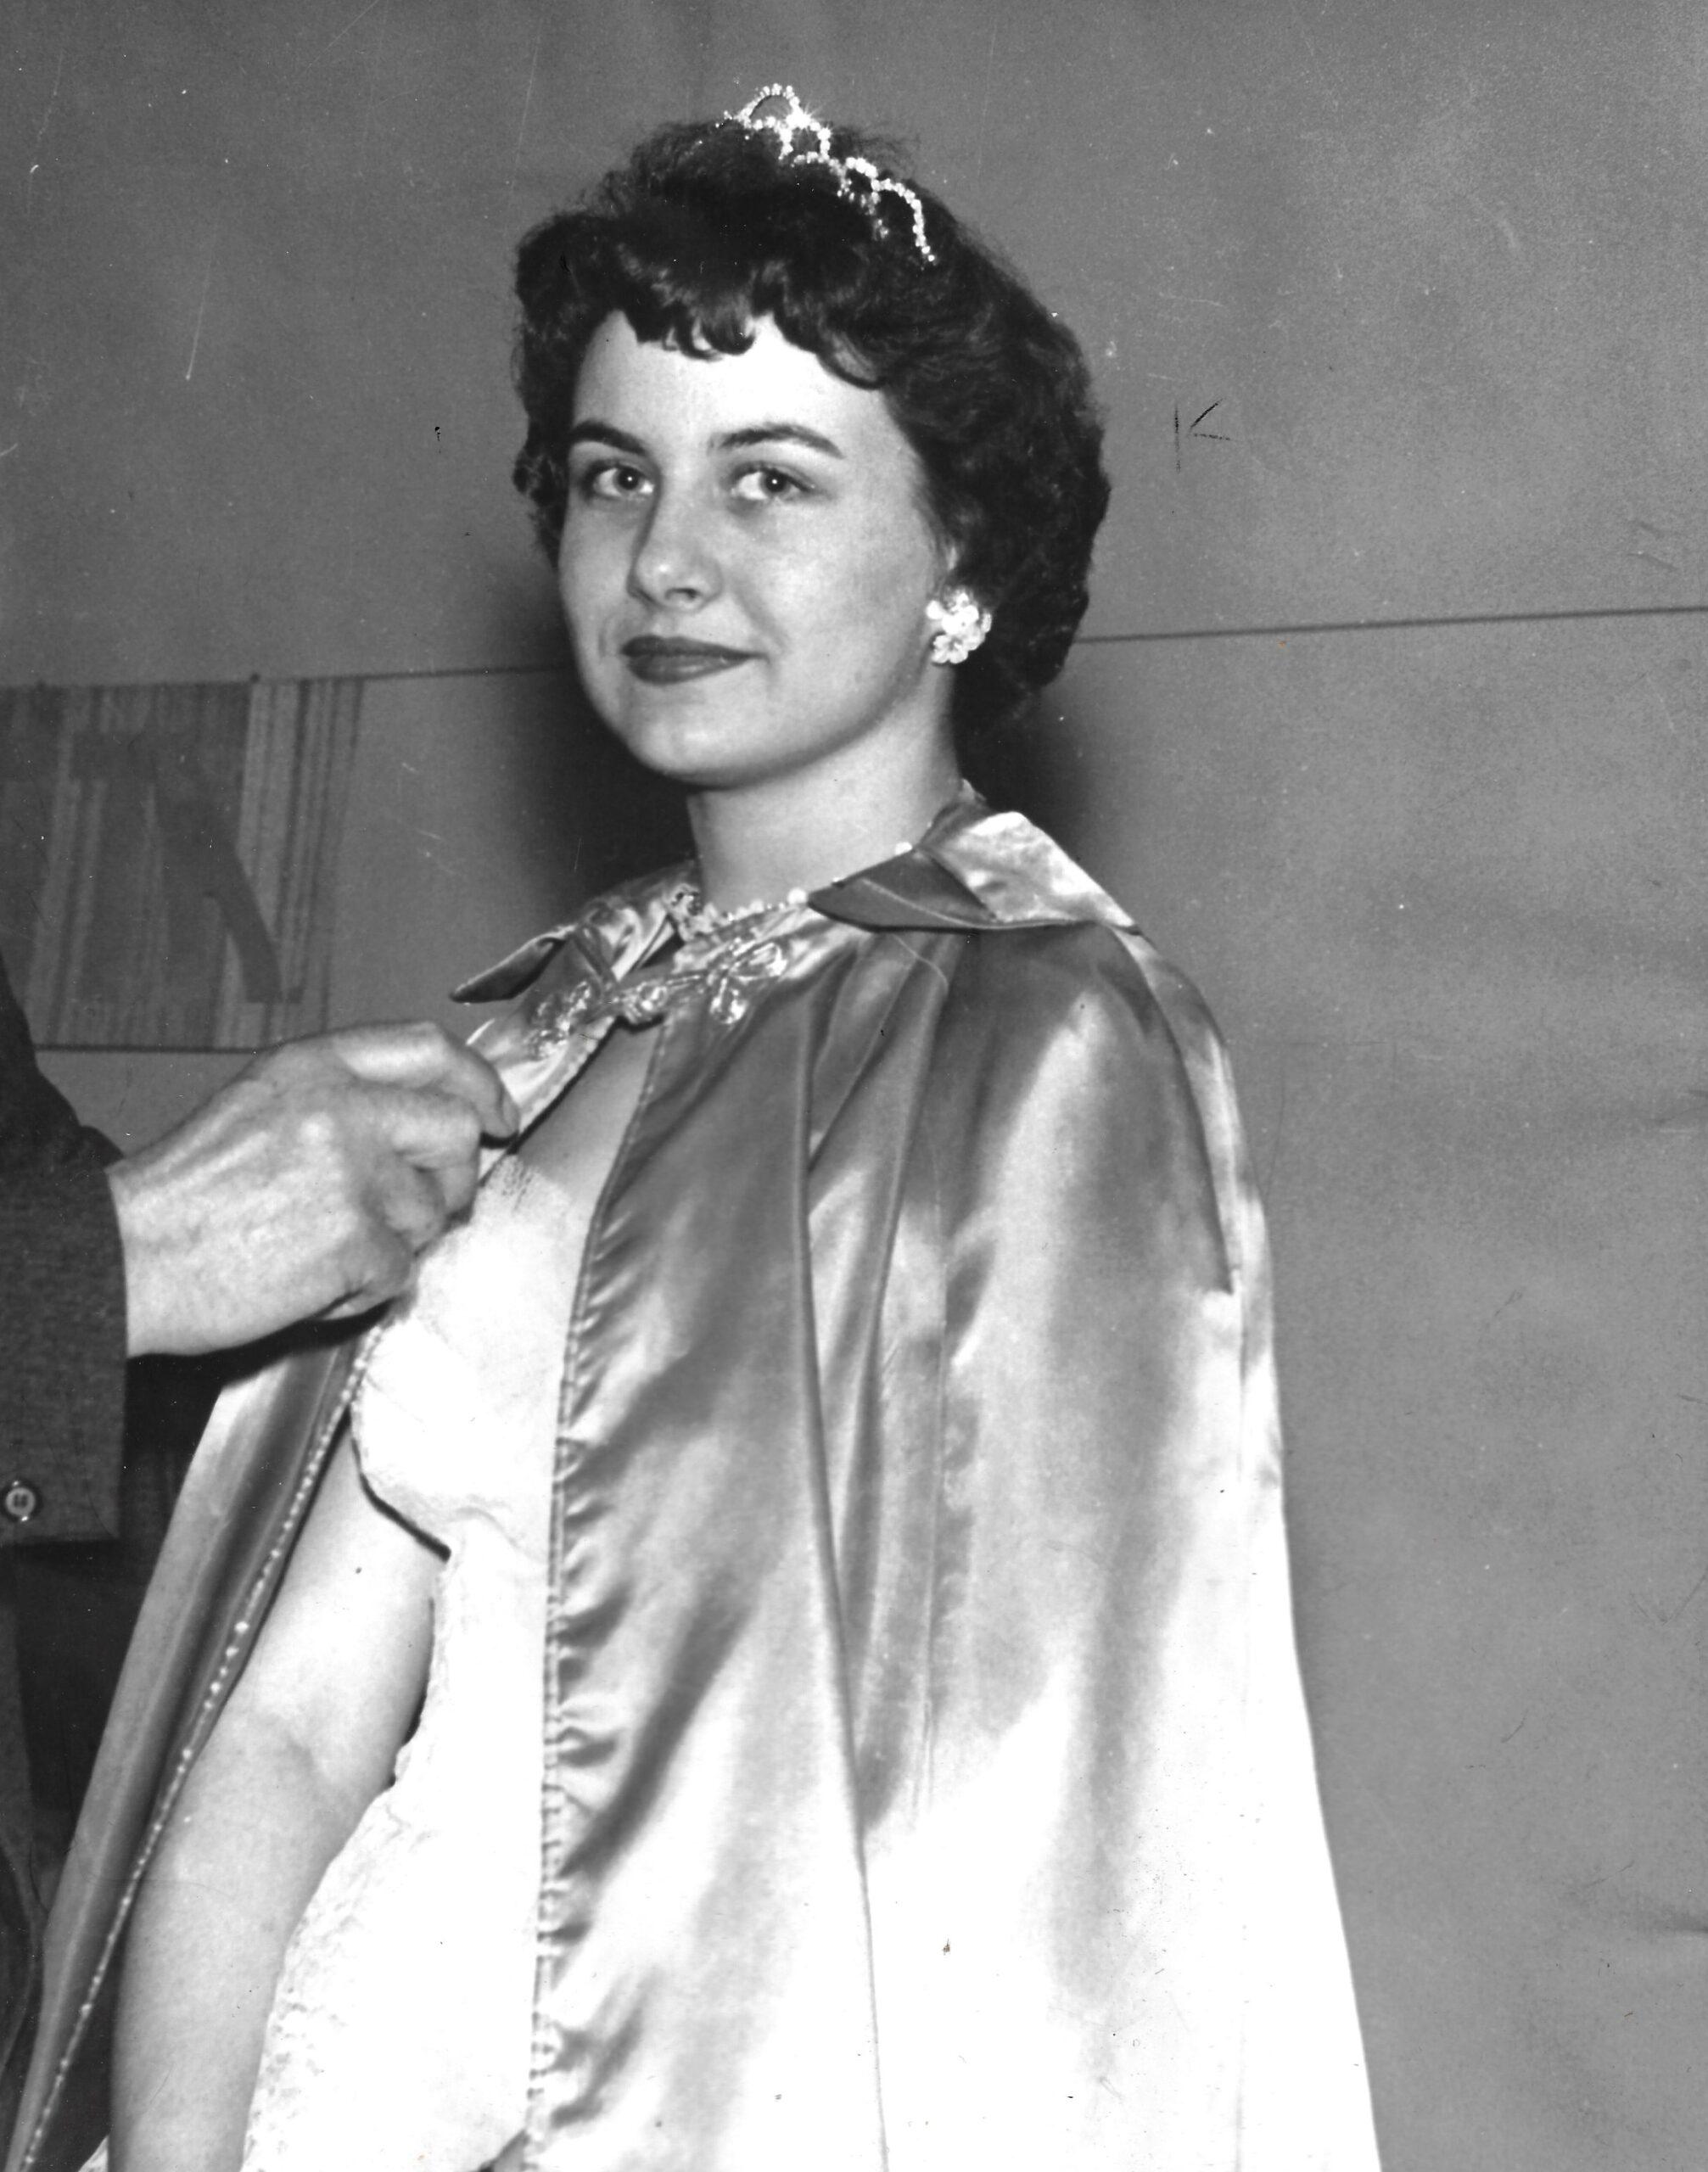 1960 Lincoln County Fair Queen